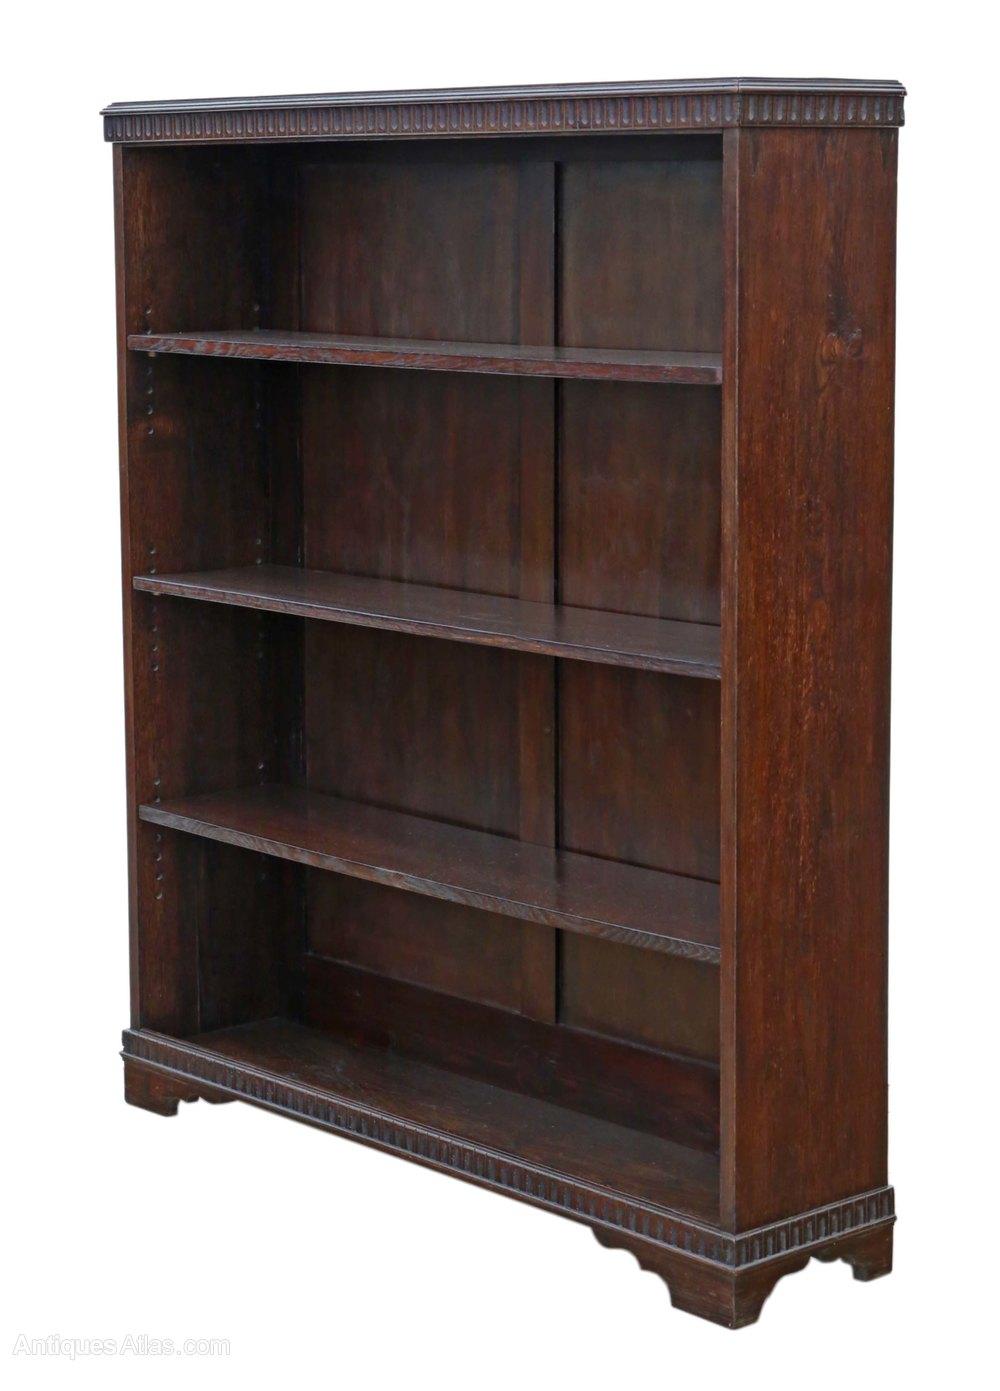 Adjustable Oak Bookcase Display Shelves C1920 Antiques Atlas